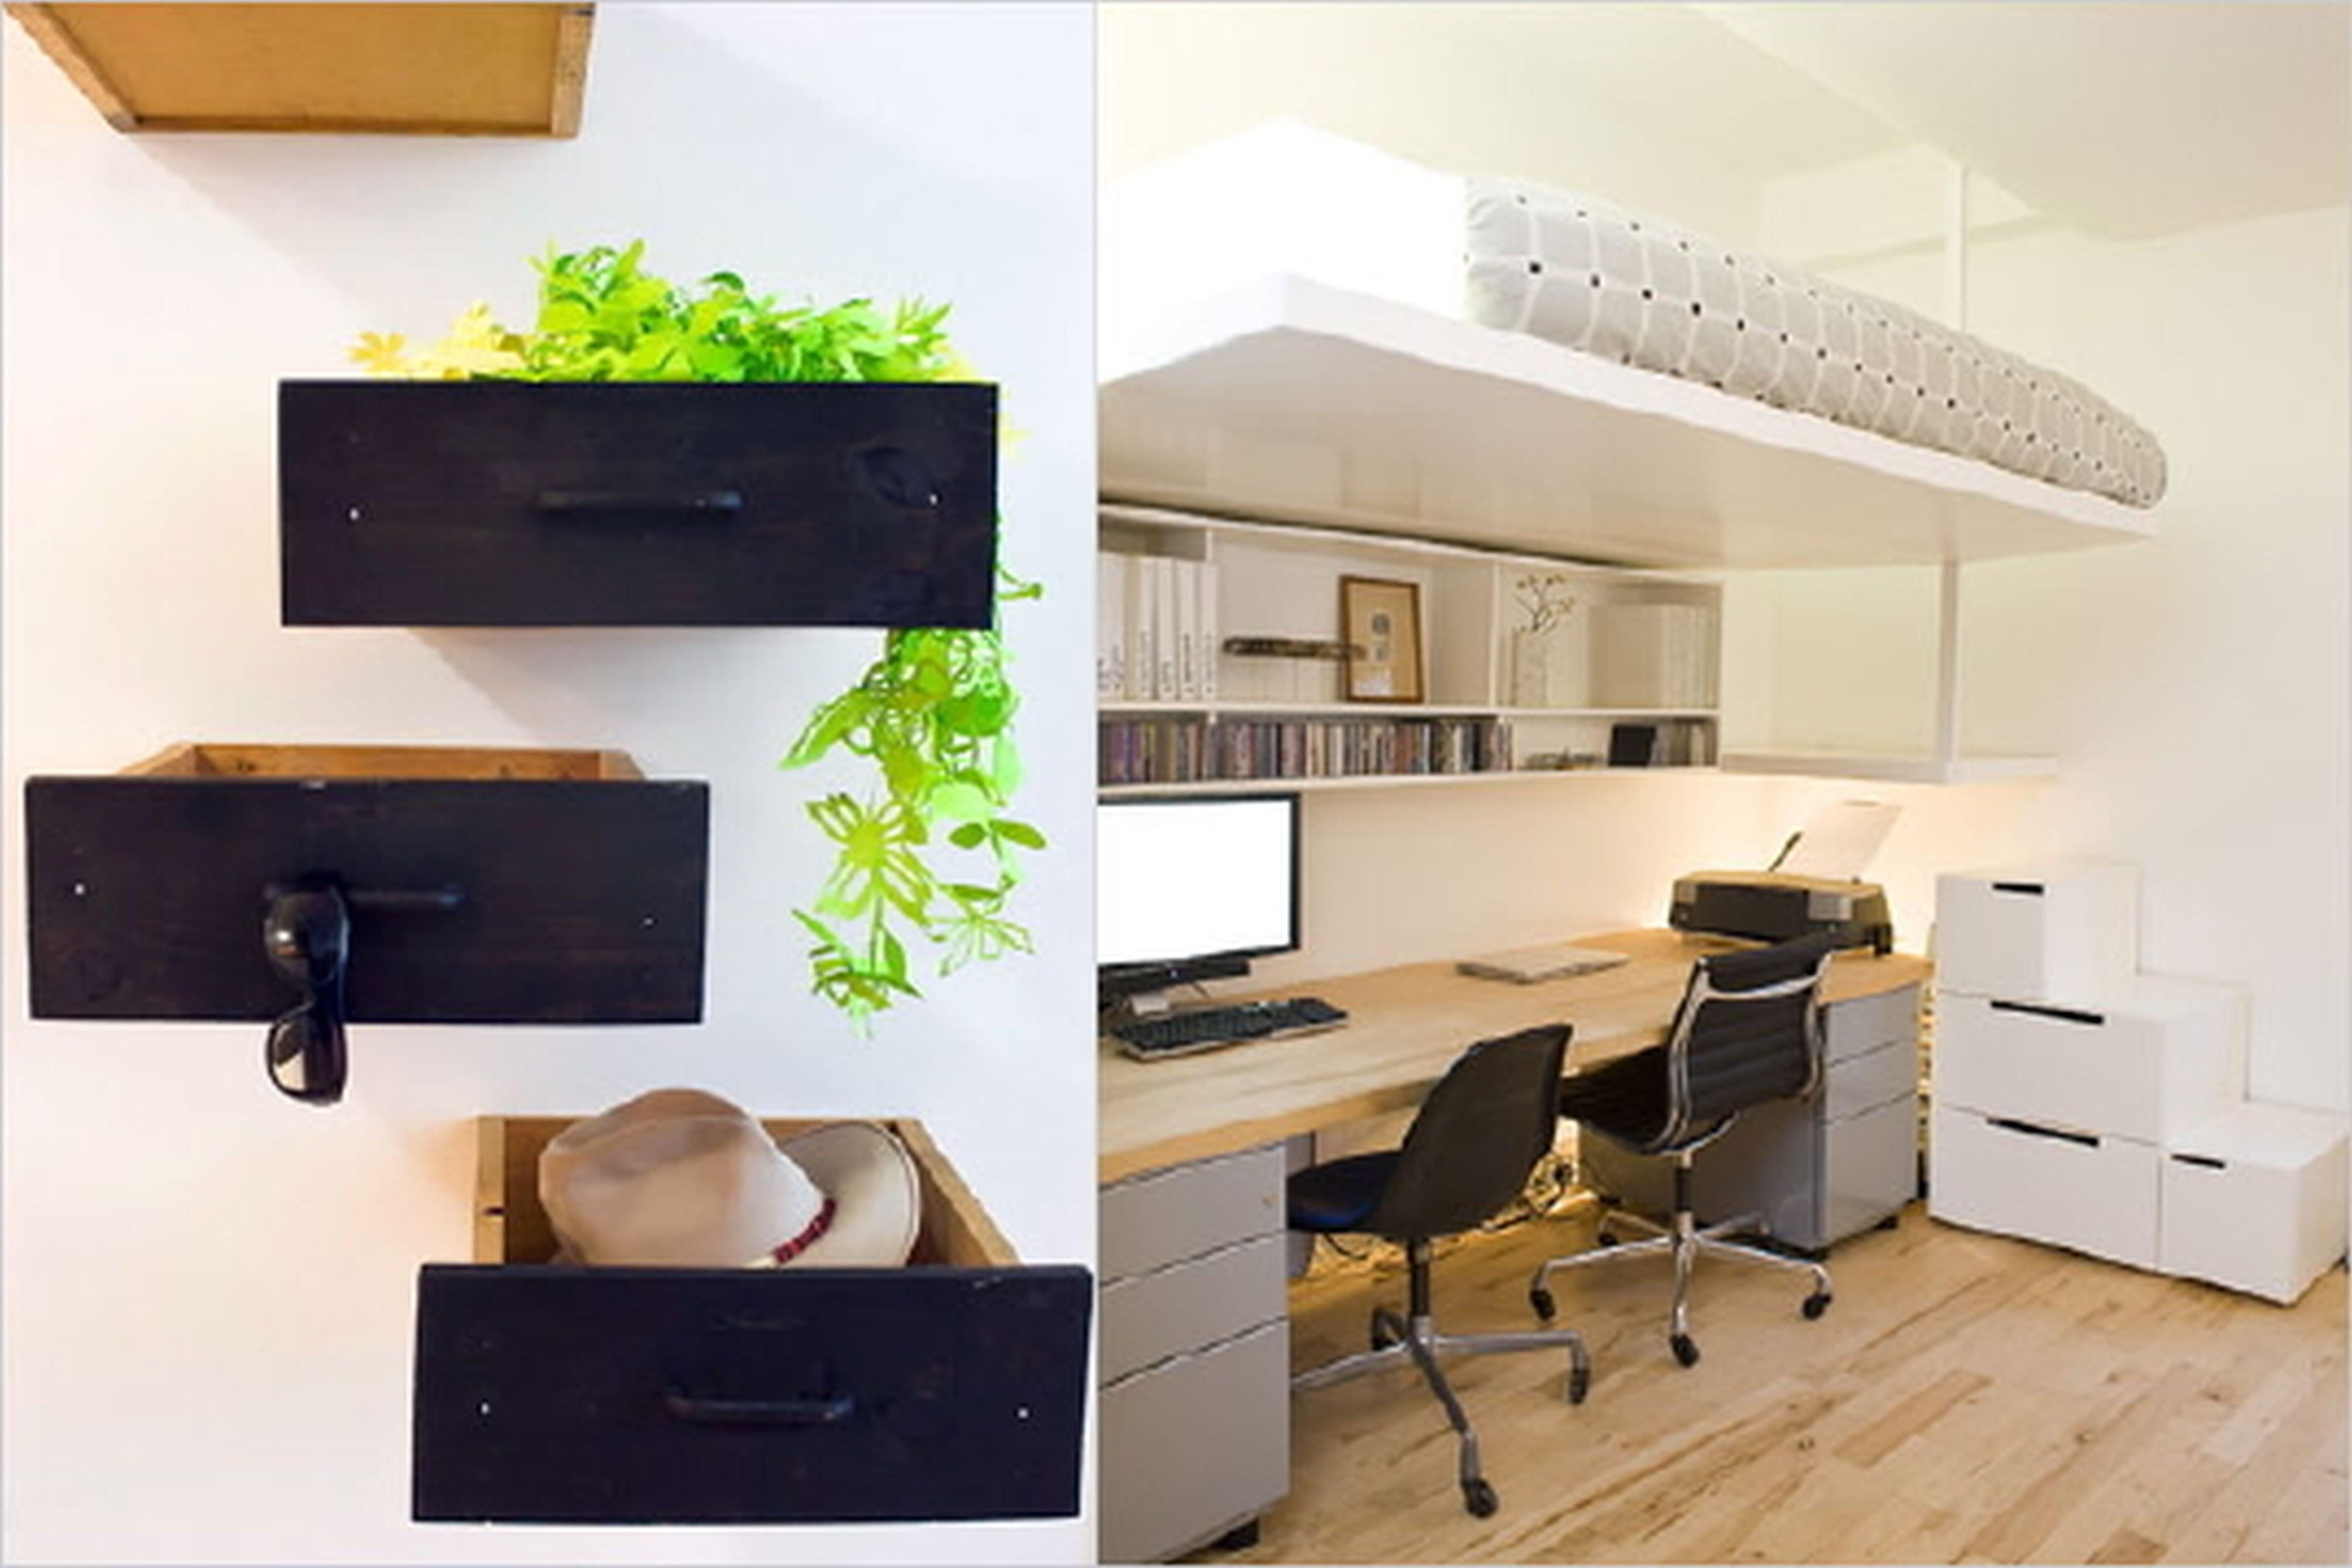 Diy Decor Ideas for Apartments New Diy Home Design